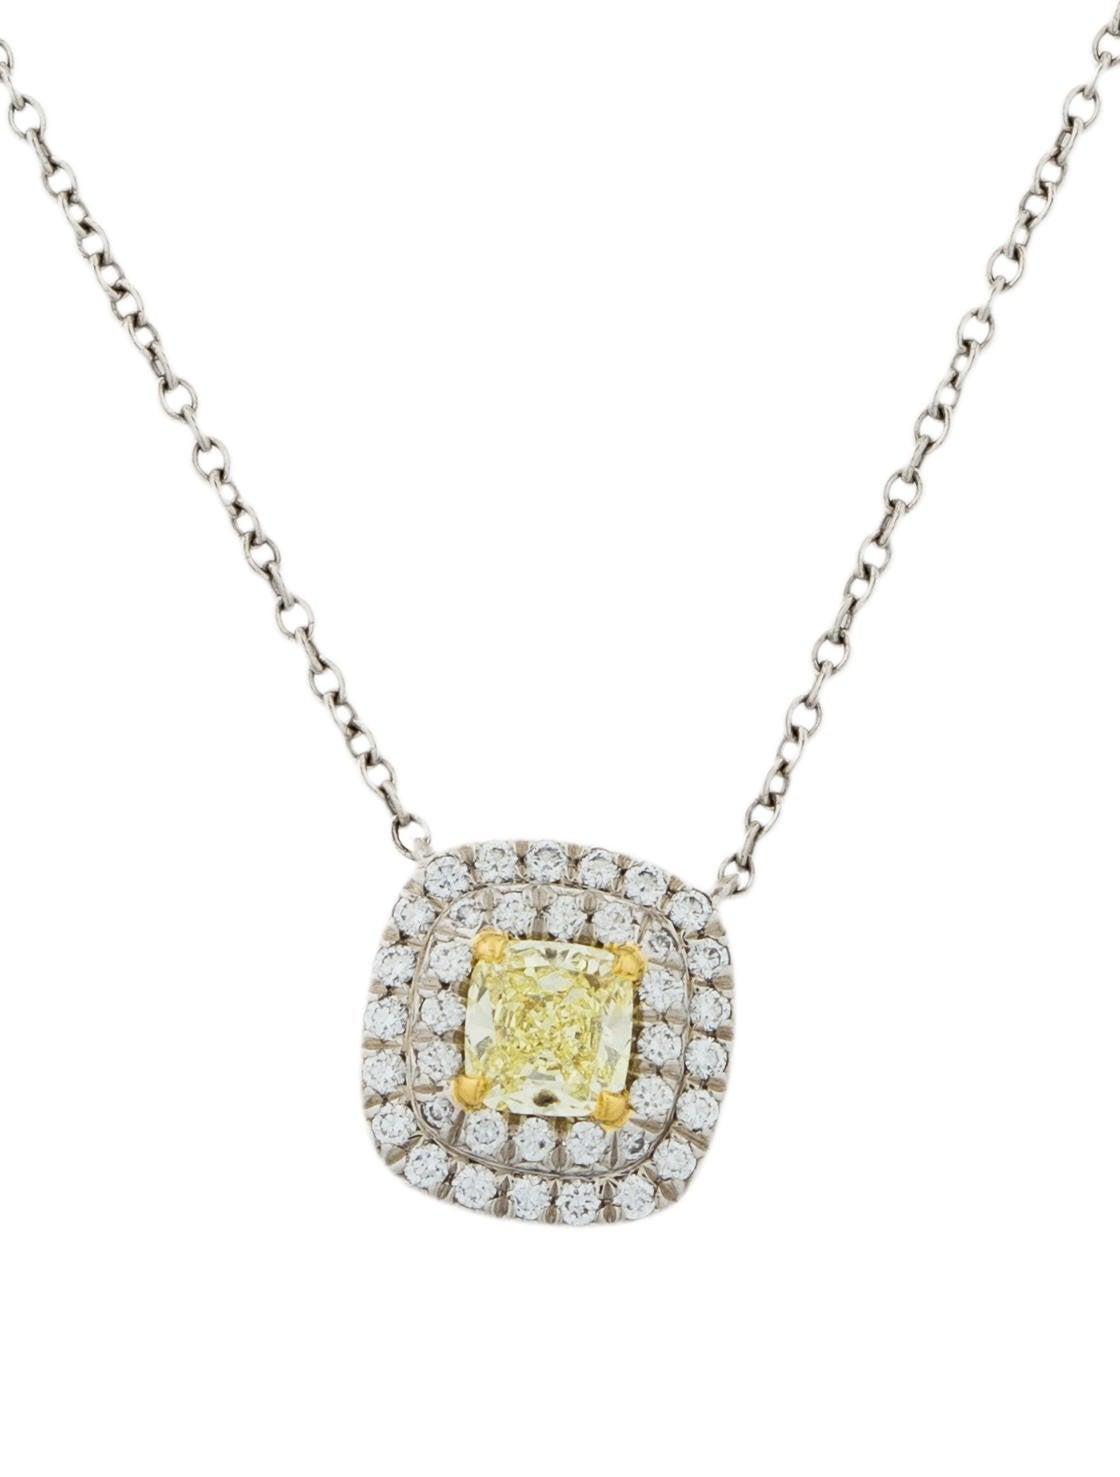 Tiffany co yellow diamond soleste pendant necklace necklaces yellow diamond soleste pendant necklace aloadofball Gallery